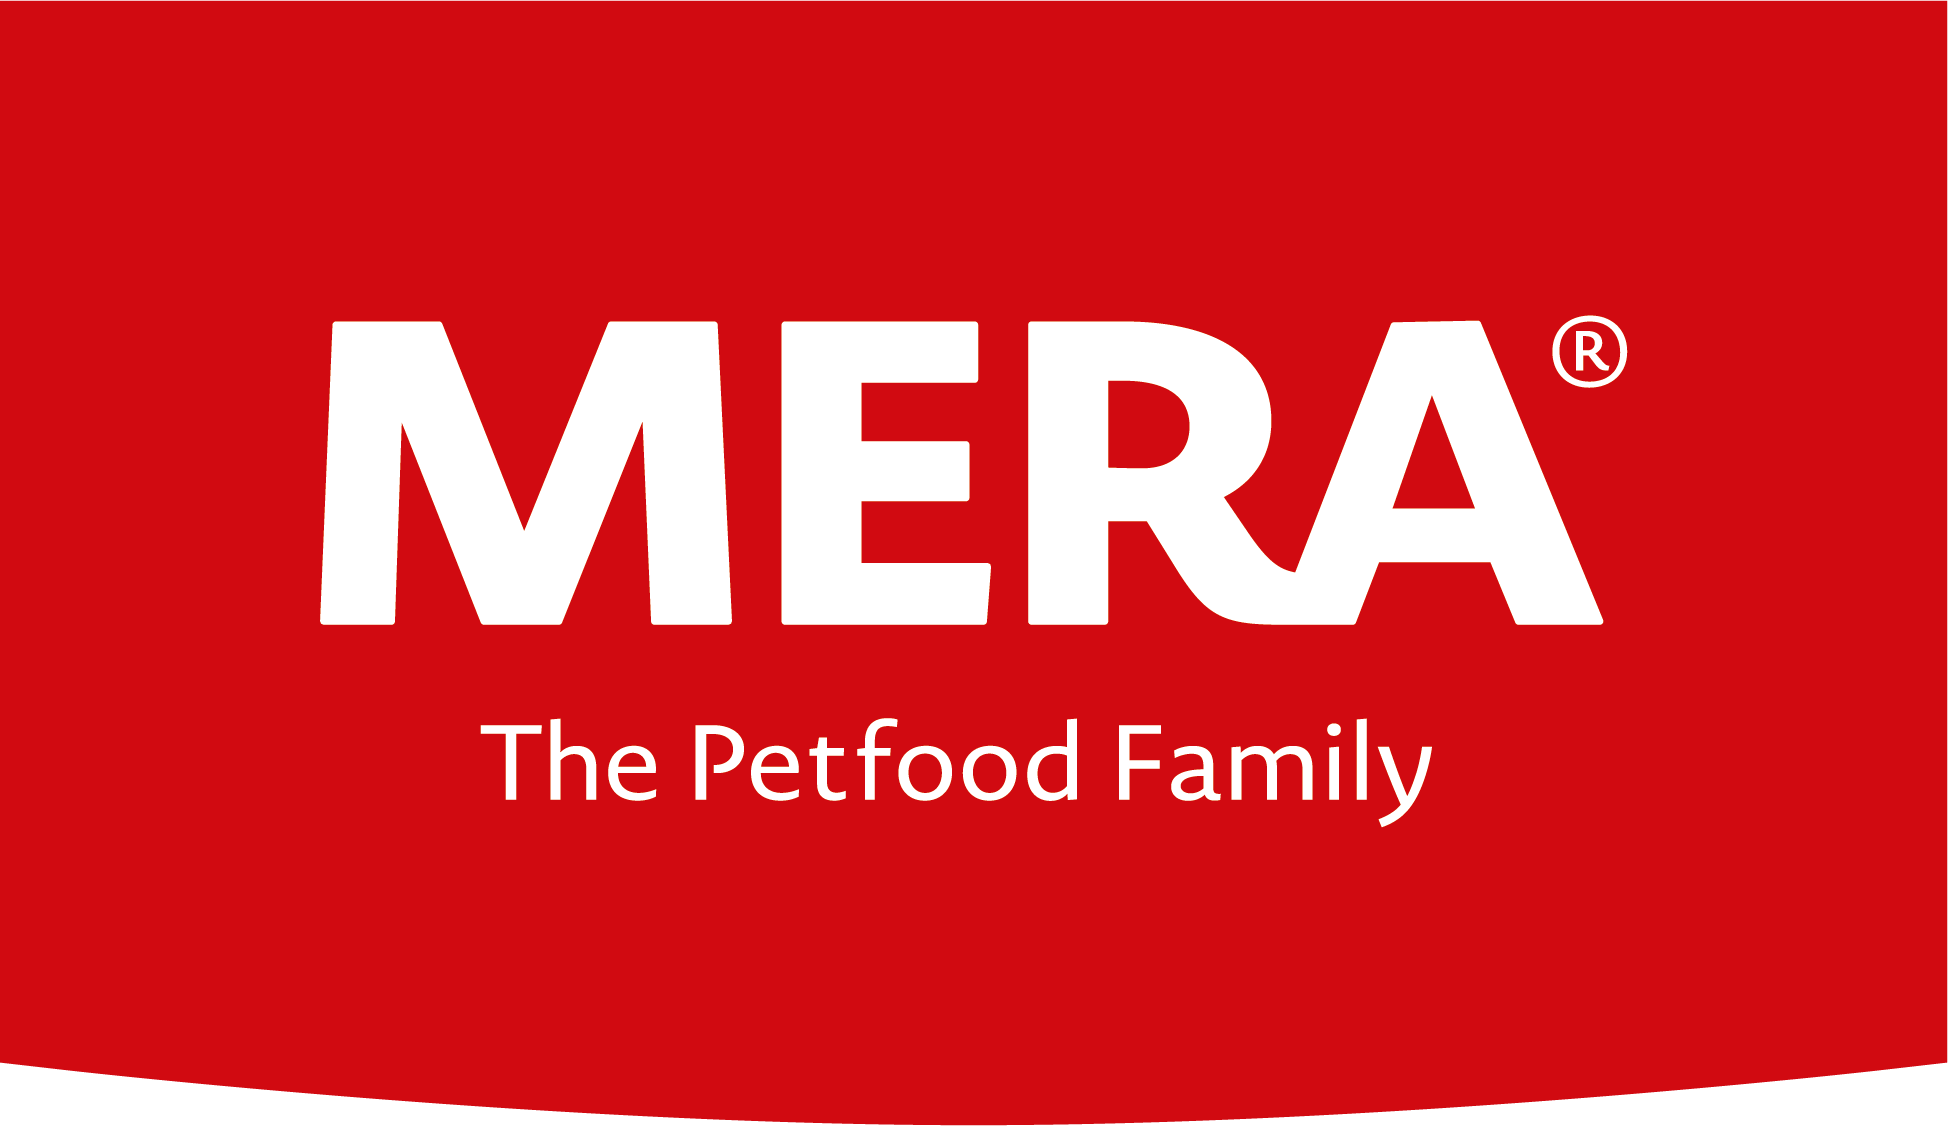 MERA - The Petfood Family